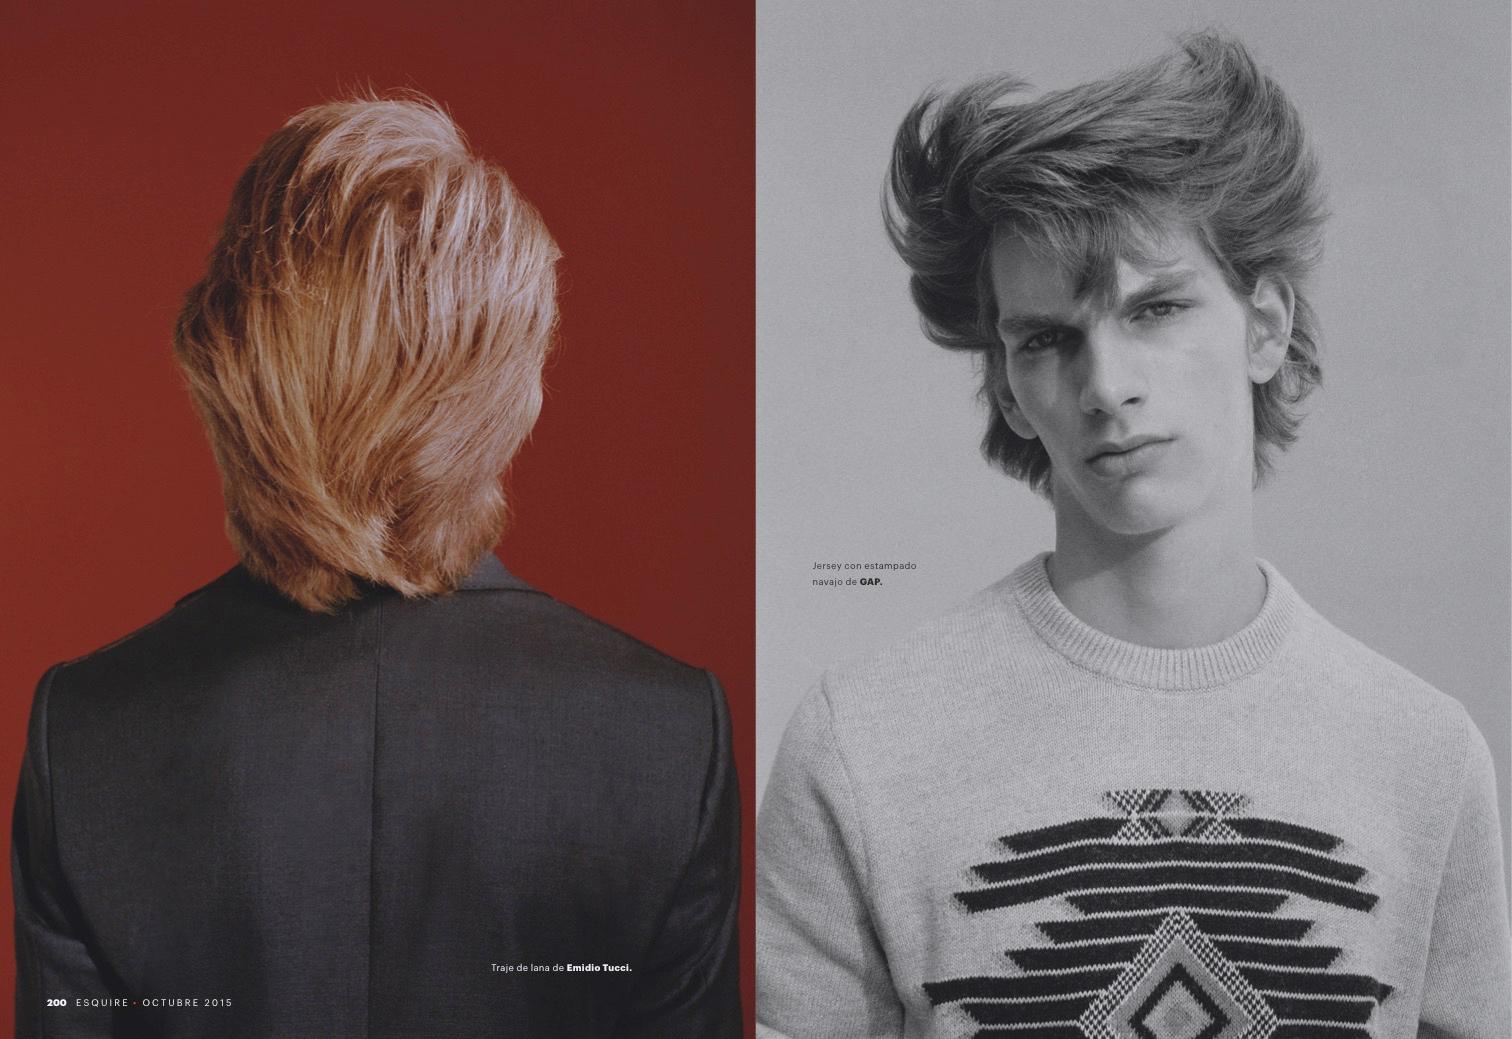 Erik Van Gils Rocks Rebellious Men S Hairstyles For